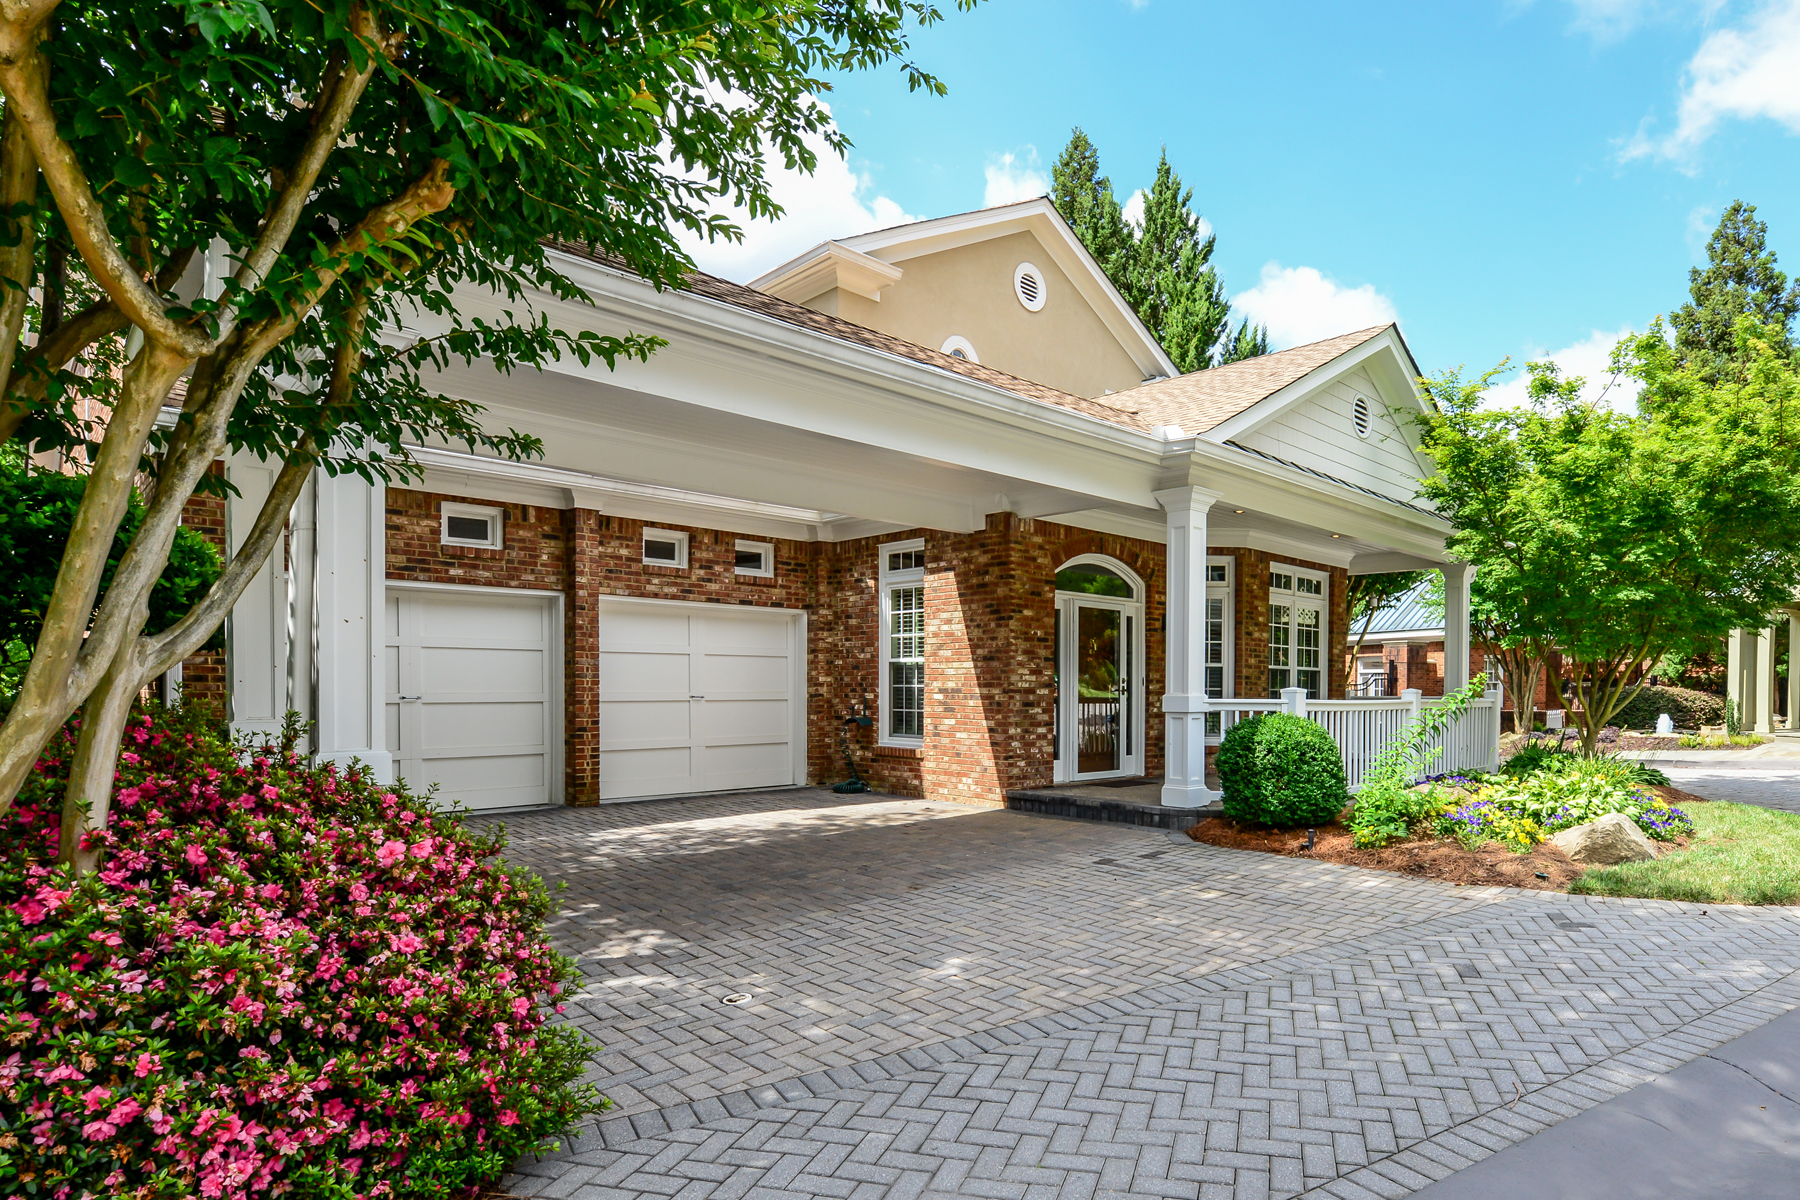 獨棟家庭住宅 為 出售 在 Buckhead/Brookhaven One Level Living 1041 Arbor Trace NE Atlanta, 喬治亞州, 30319 美國